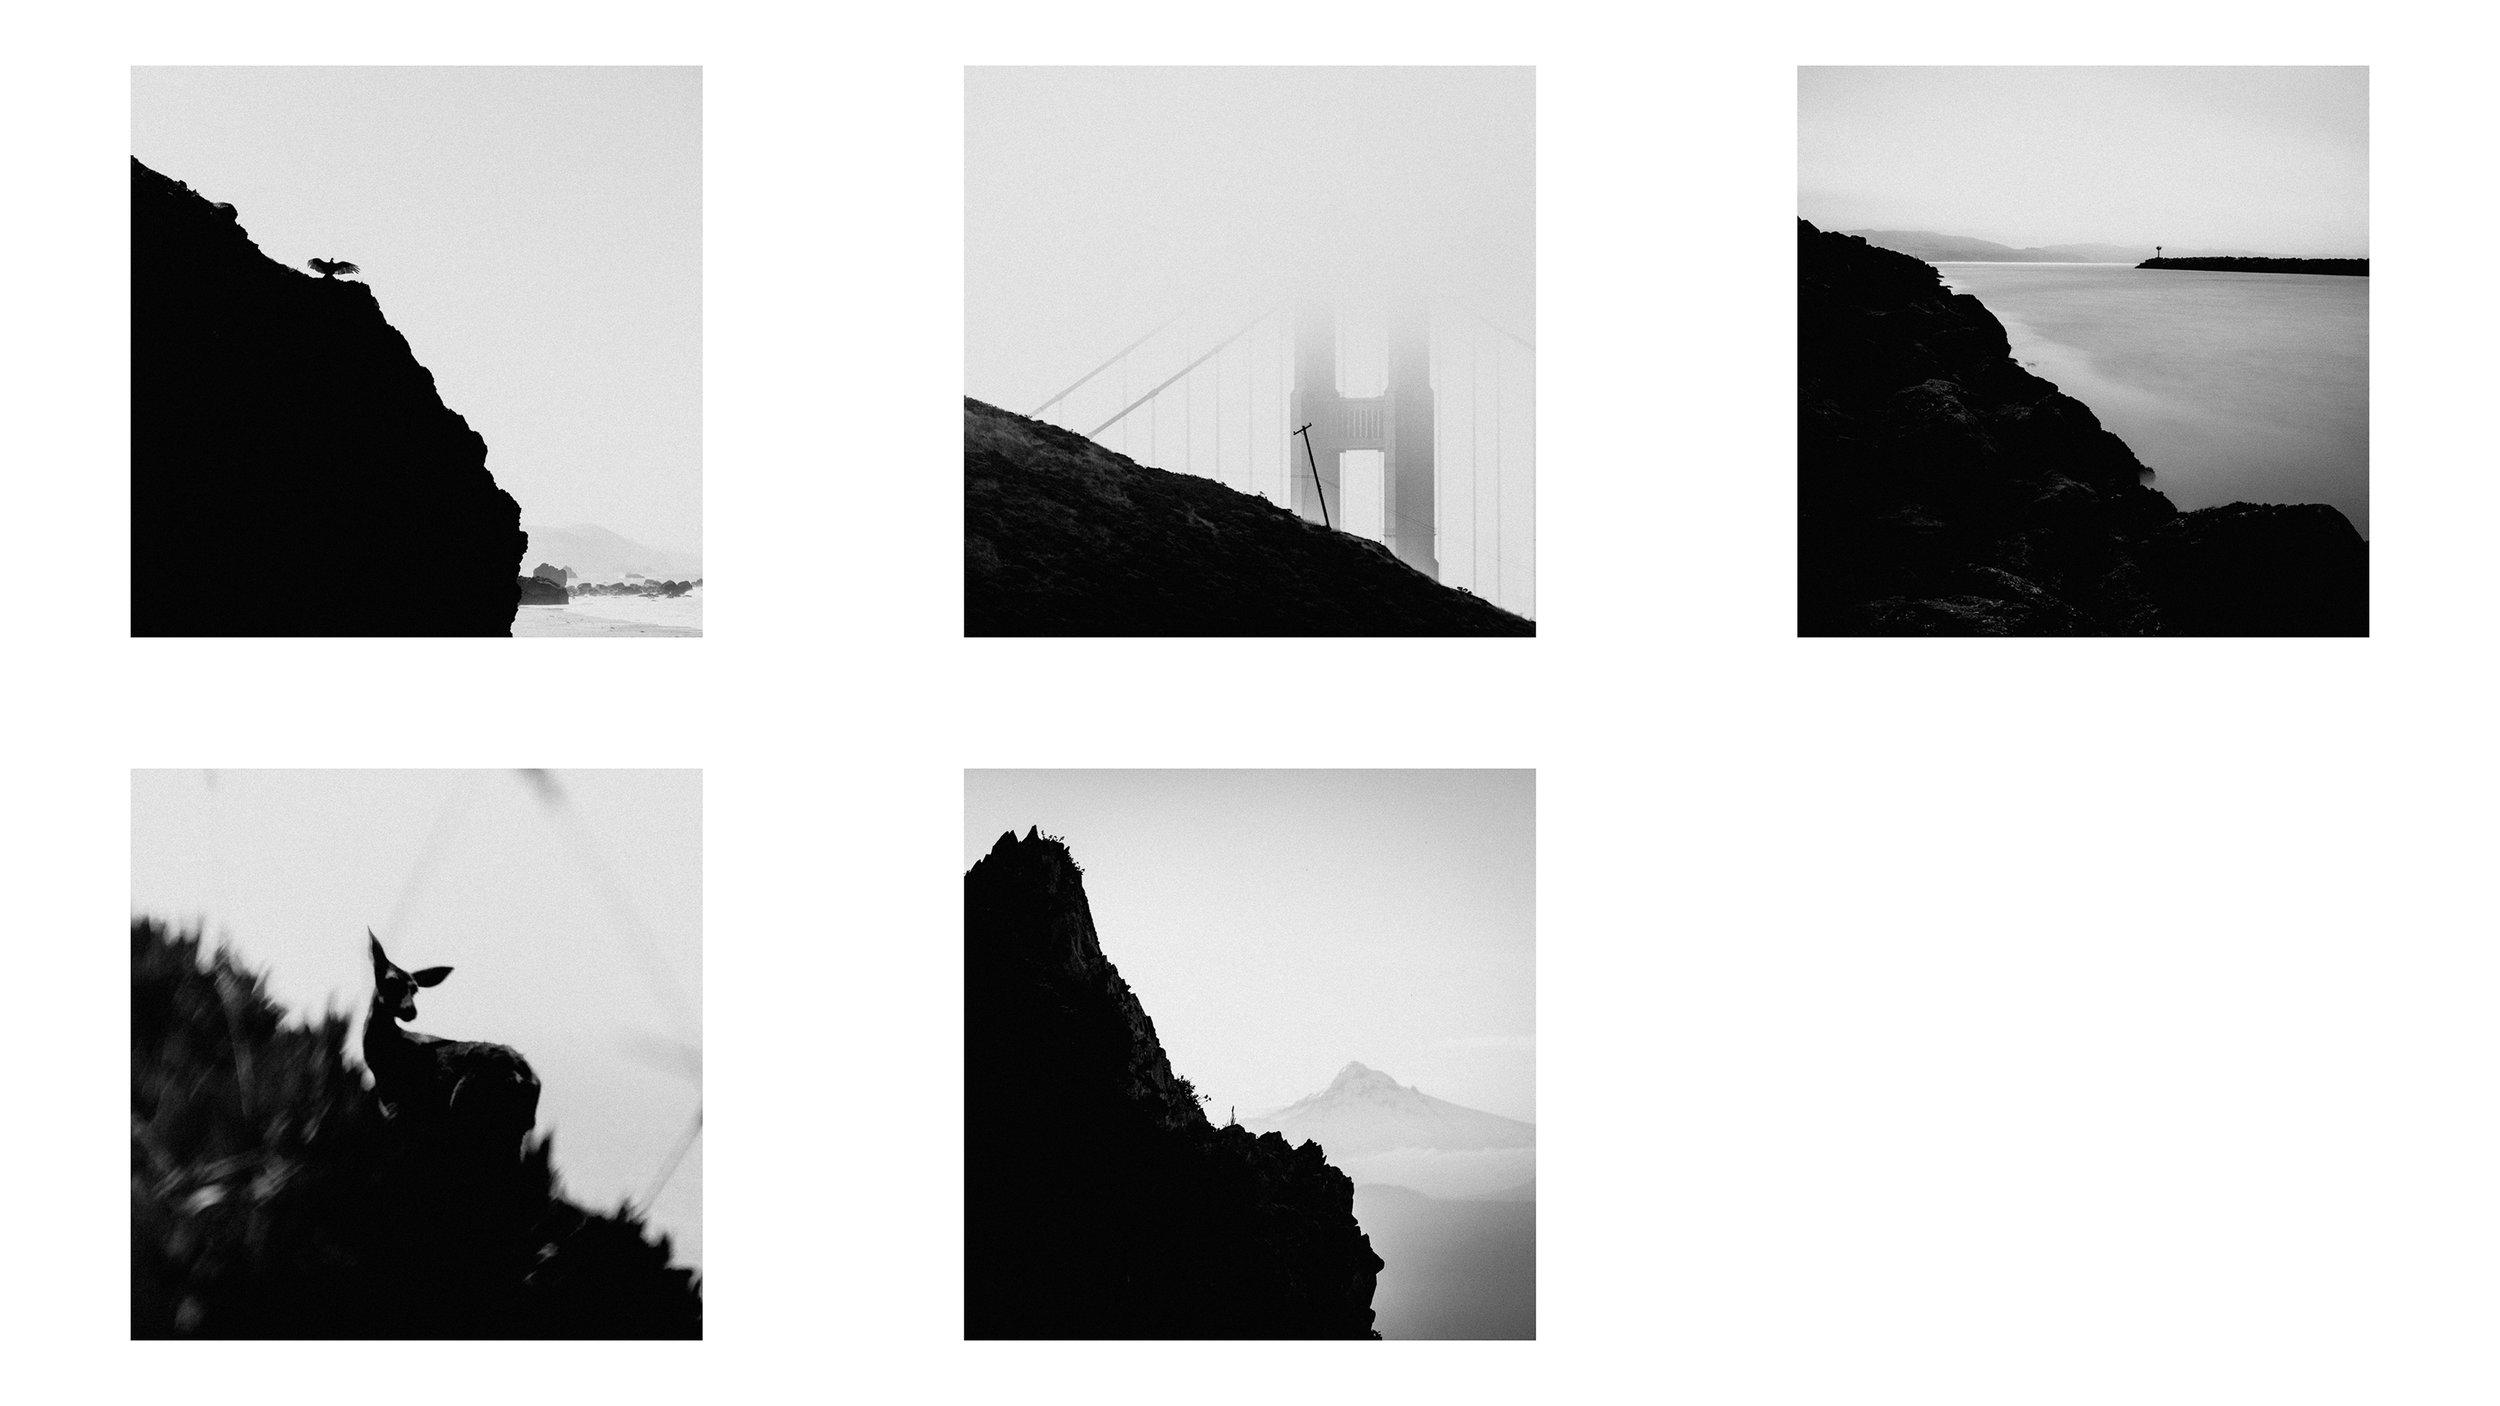 images_post.jpg